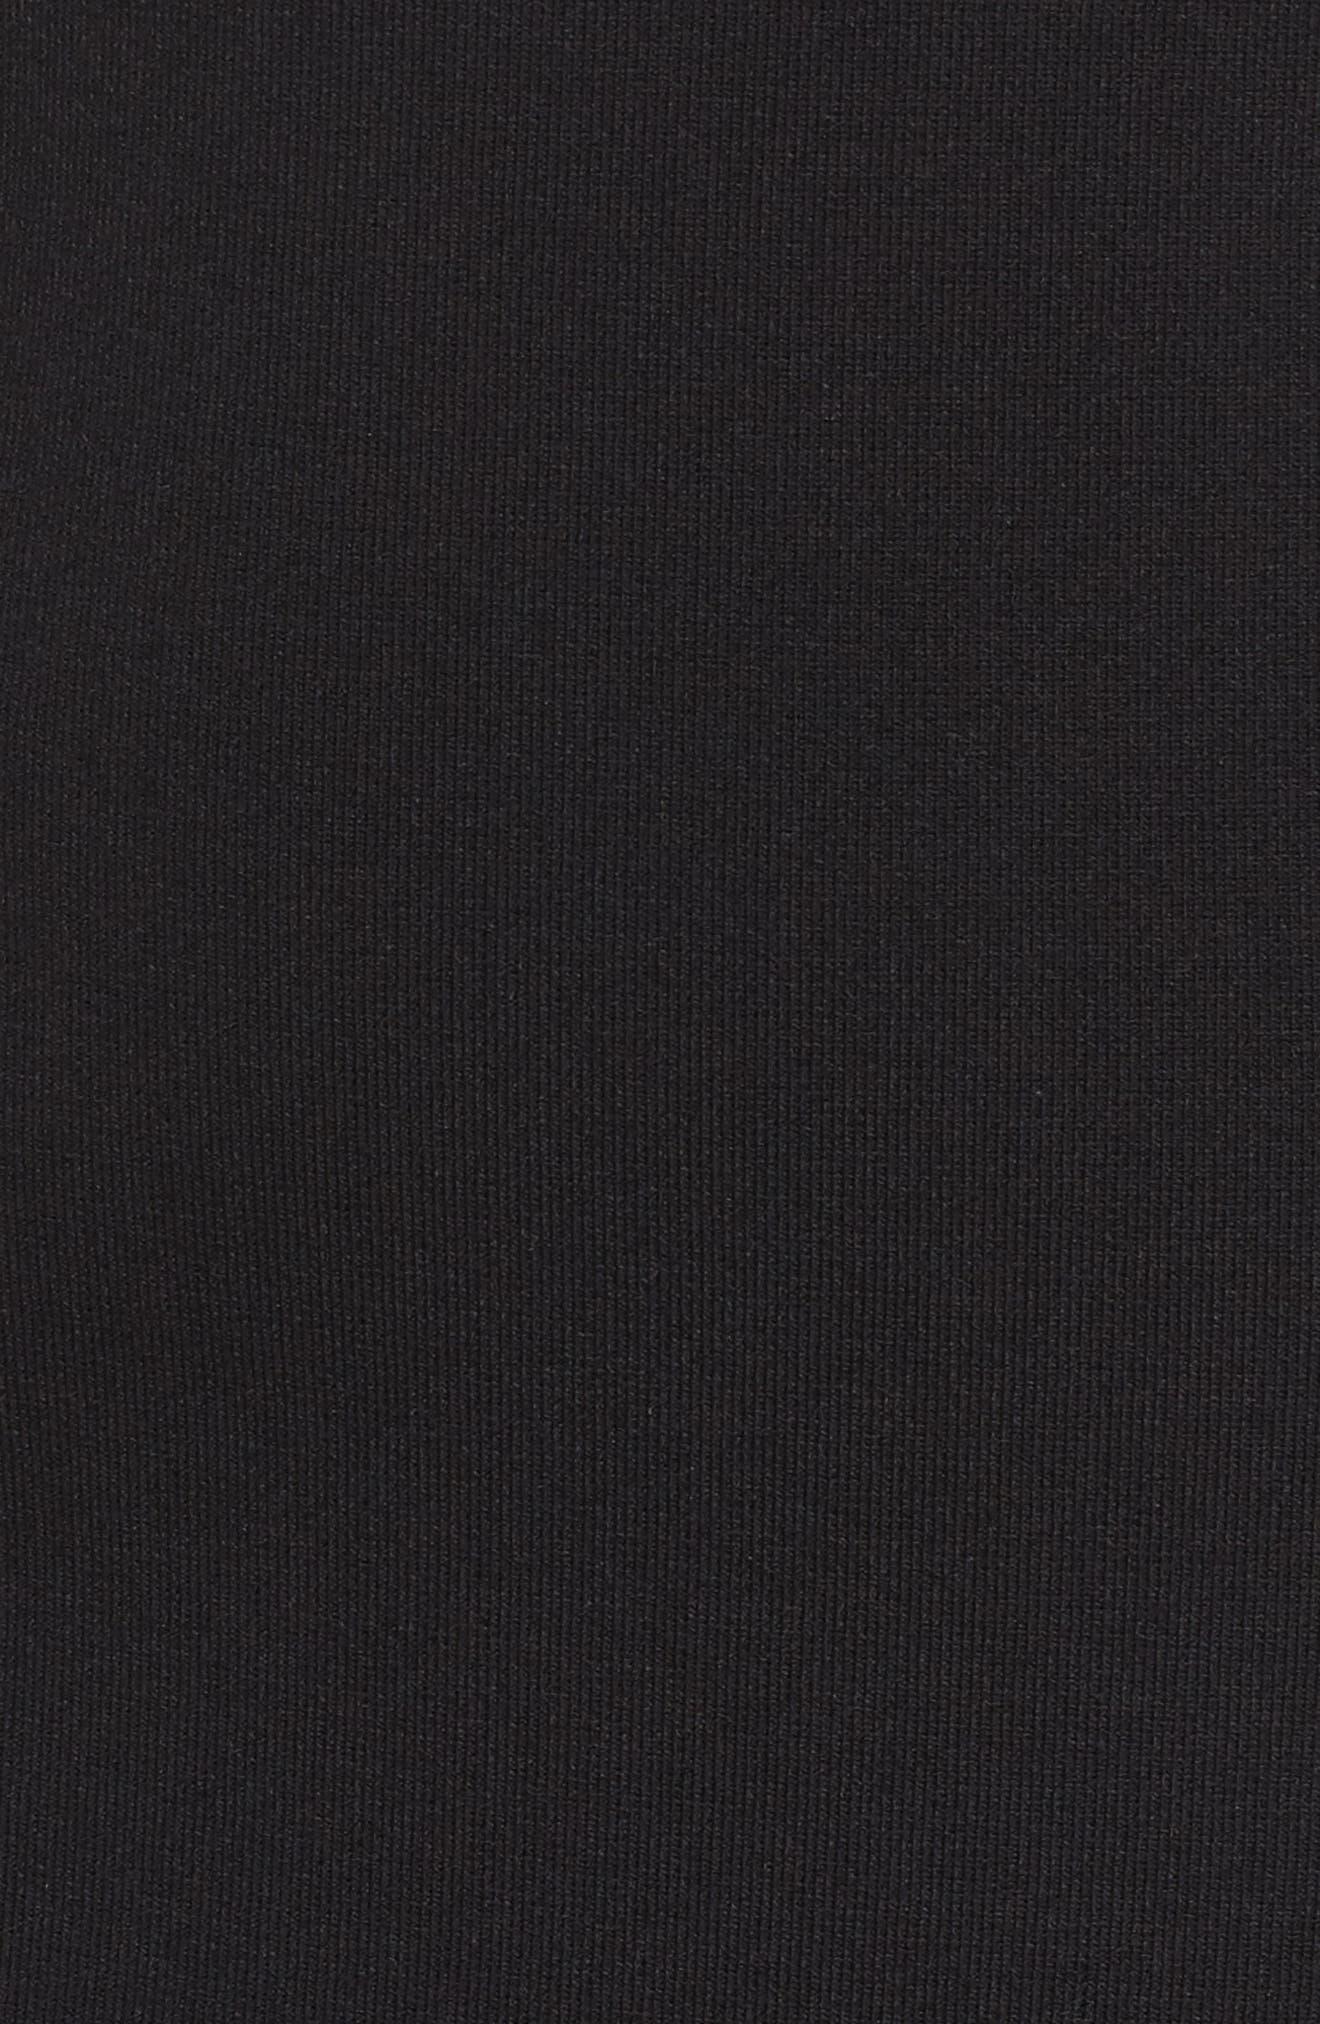 Studded Asymmetrical Dress,                             Alternate thumbnail 5, color,                             004